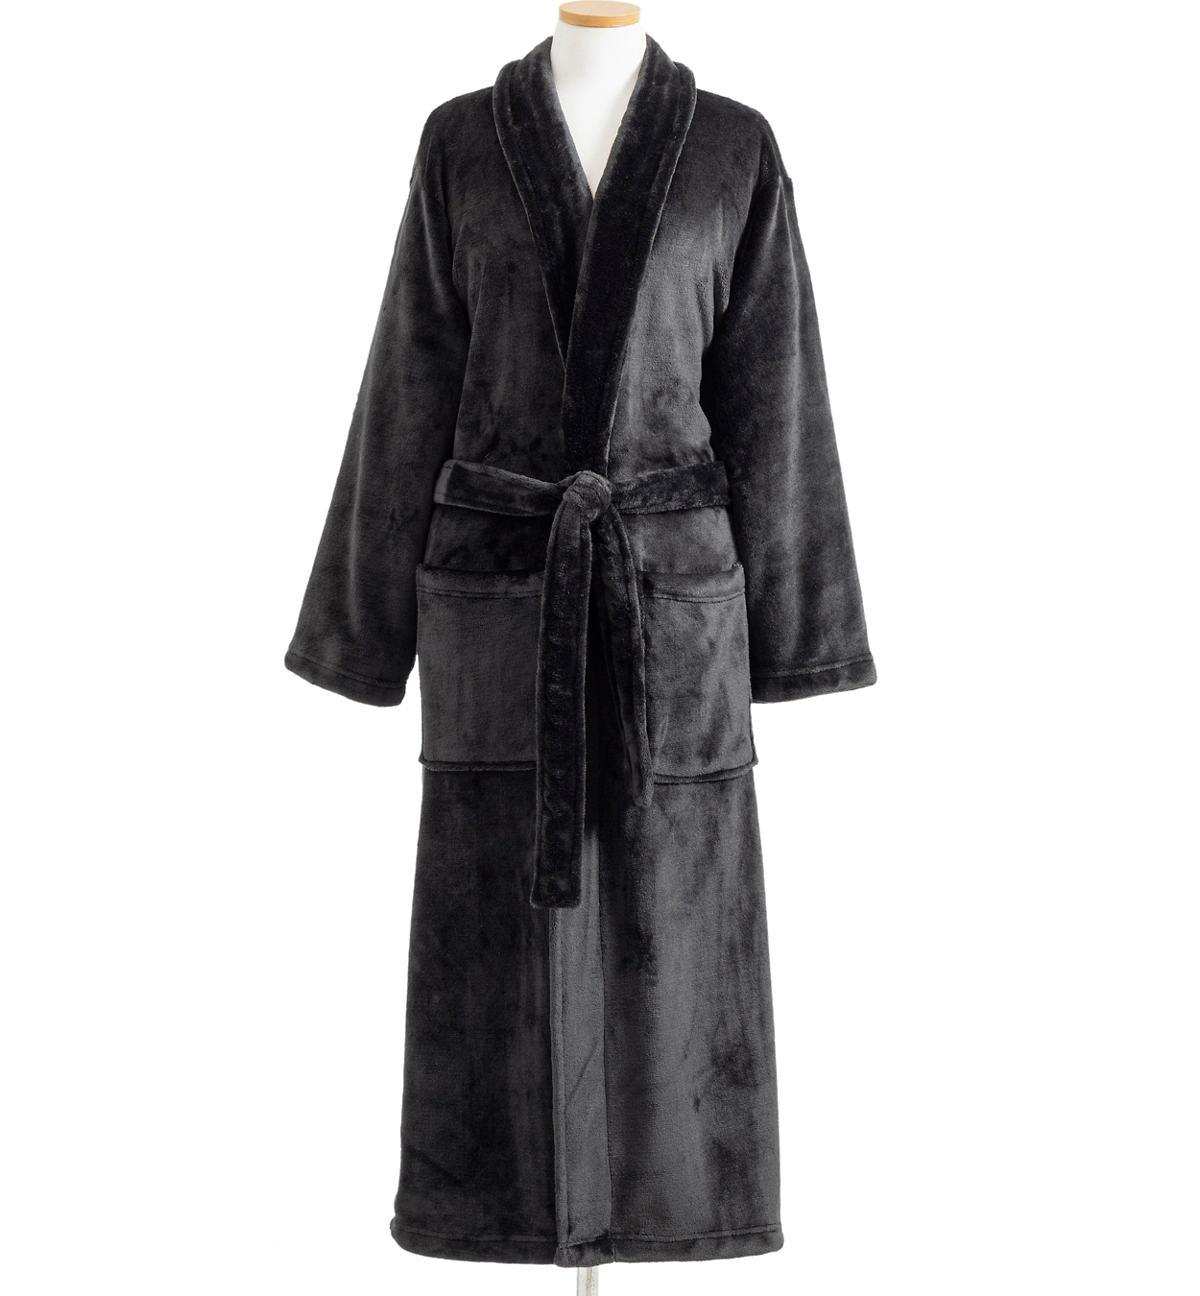 Sheepy Fleece 2.0 Black Robe